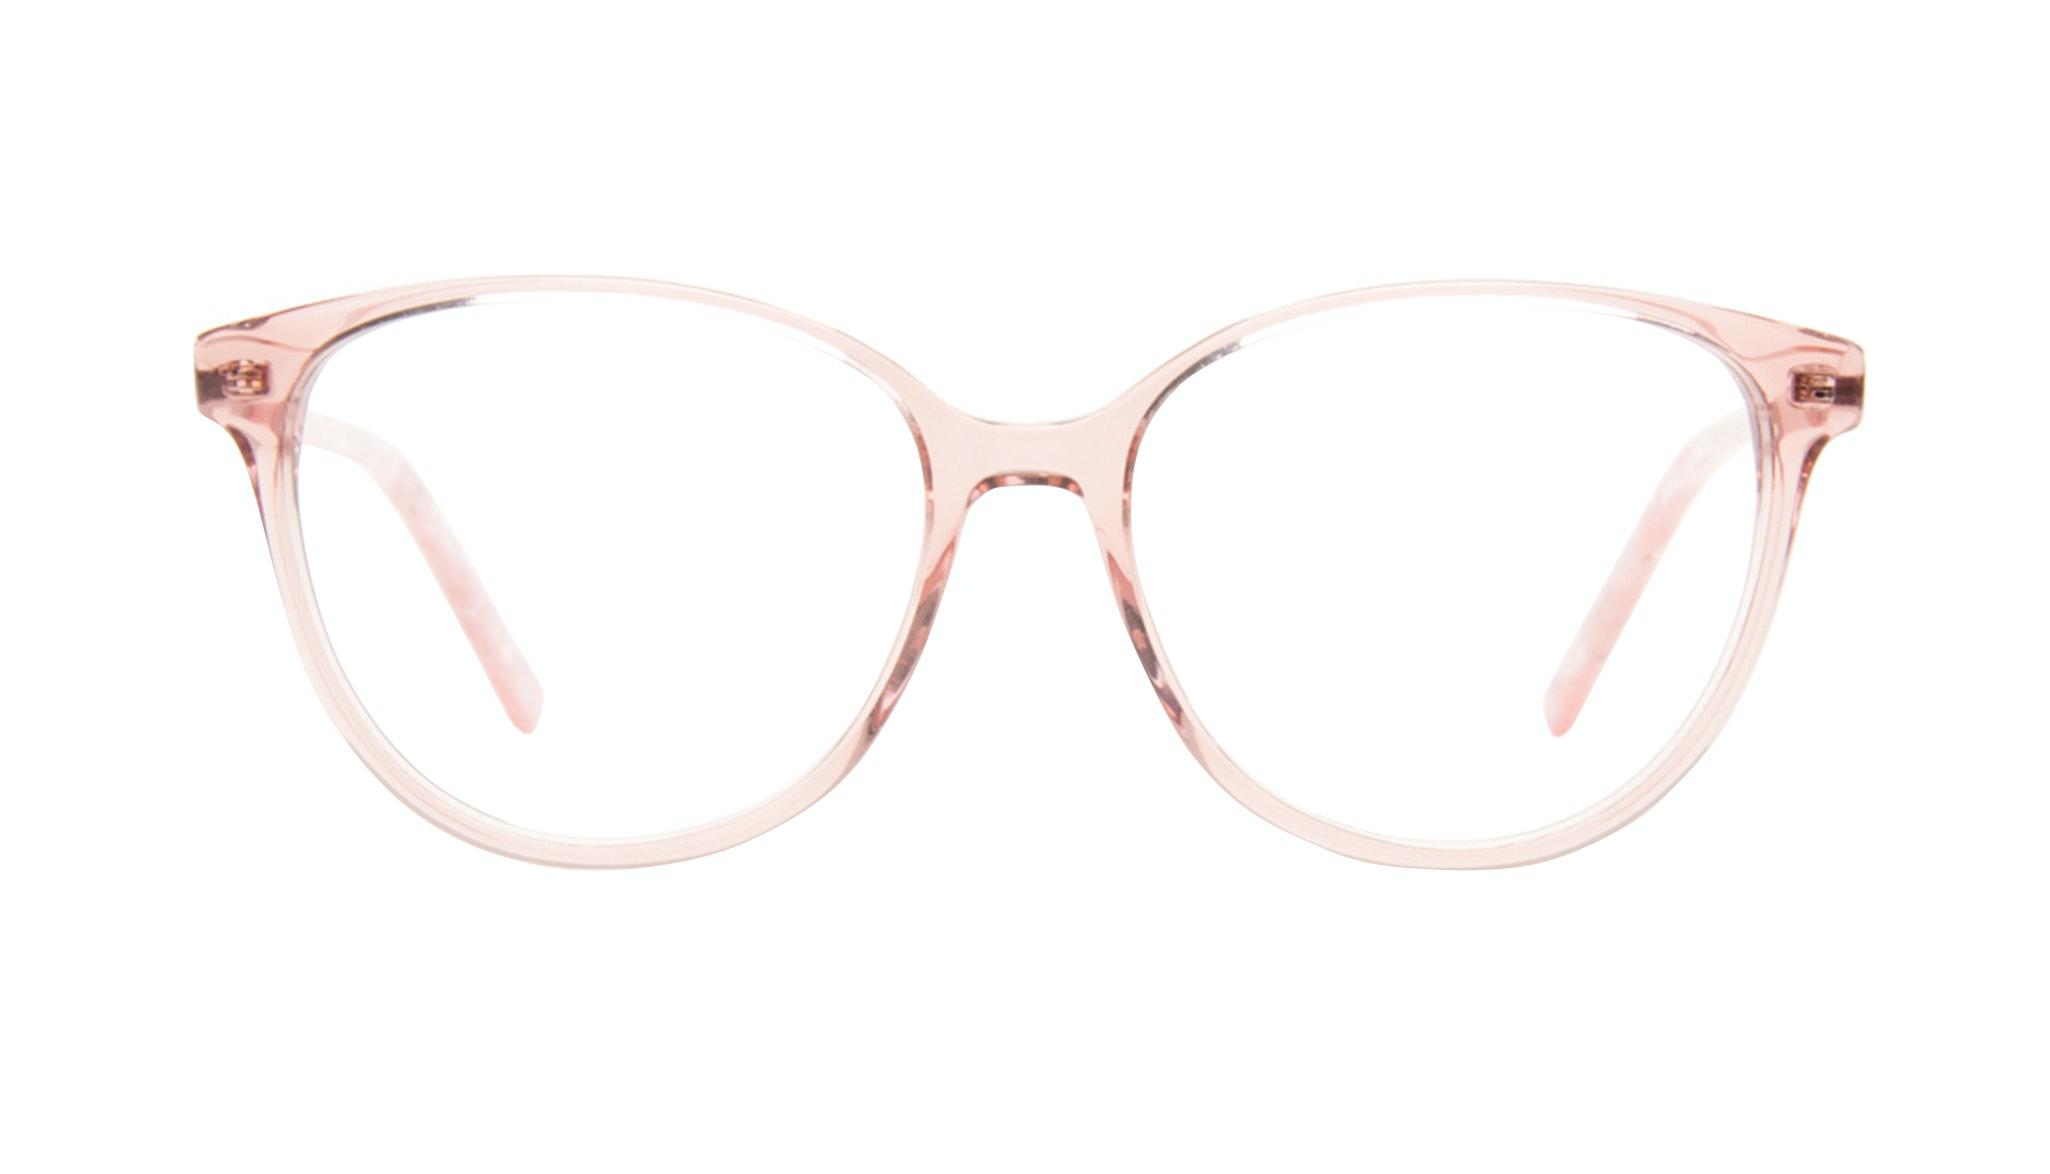 Affordable Fashion Glasses Cat Eye Eyeglasses Women Imagine II Rose Marble Front